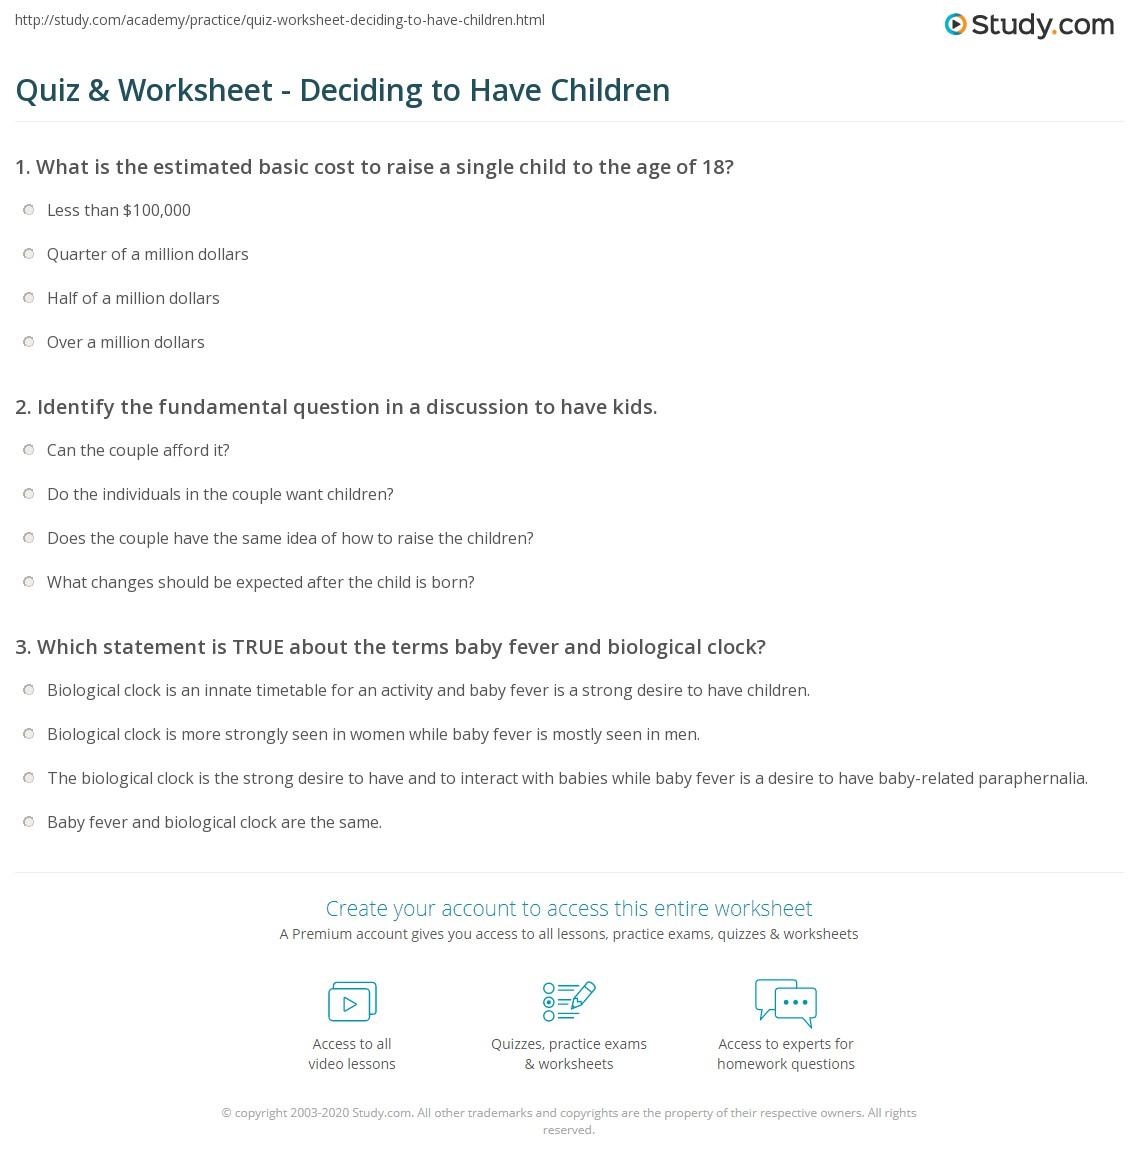 Quiz & Worksheet - Deciding to Have Children   Study.com